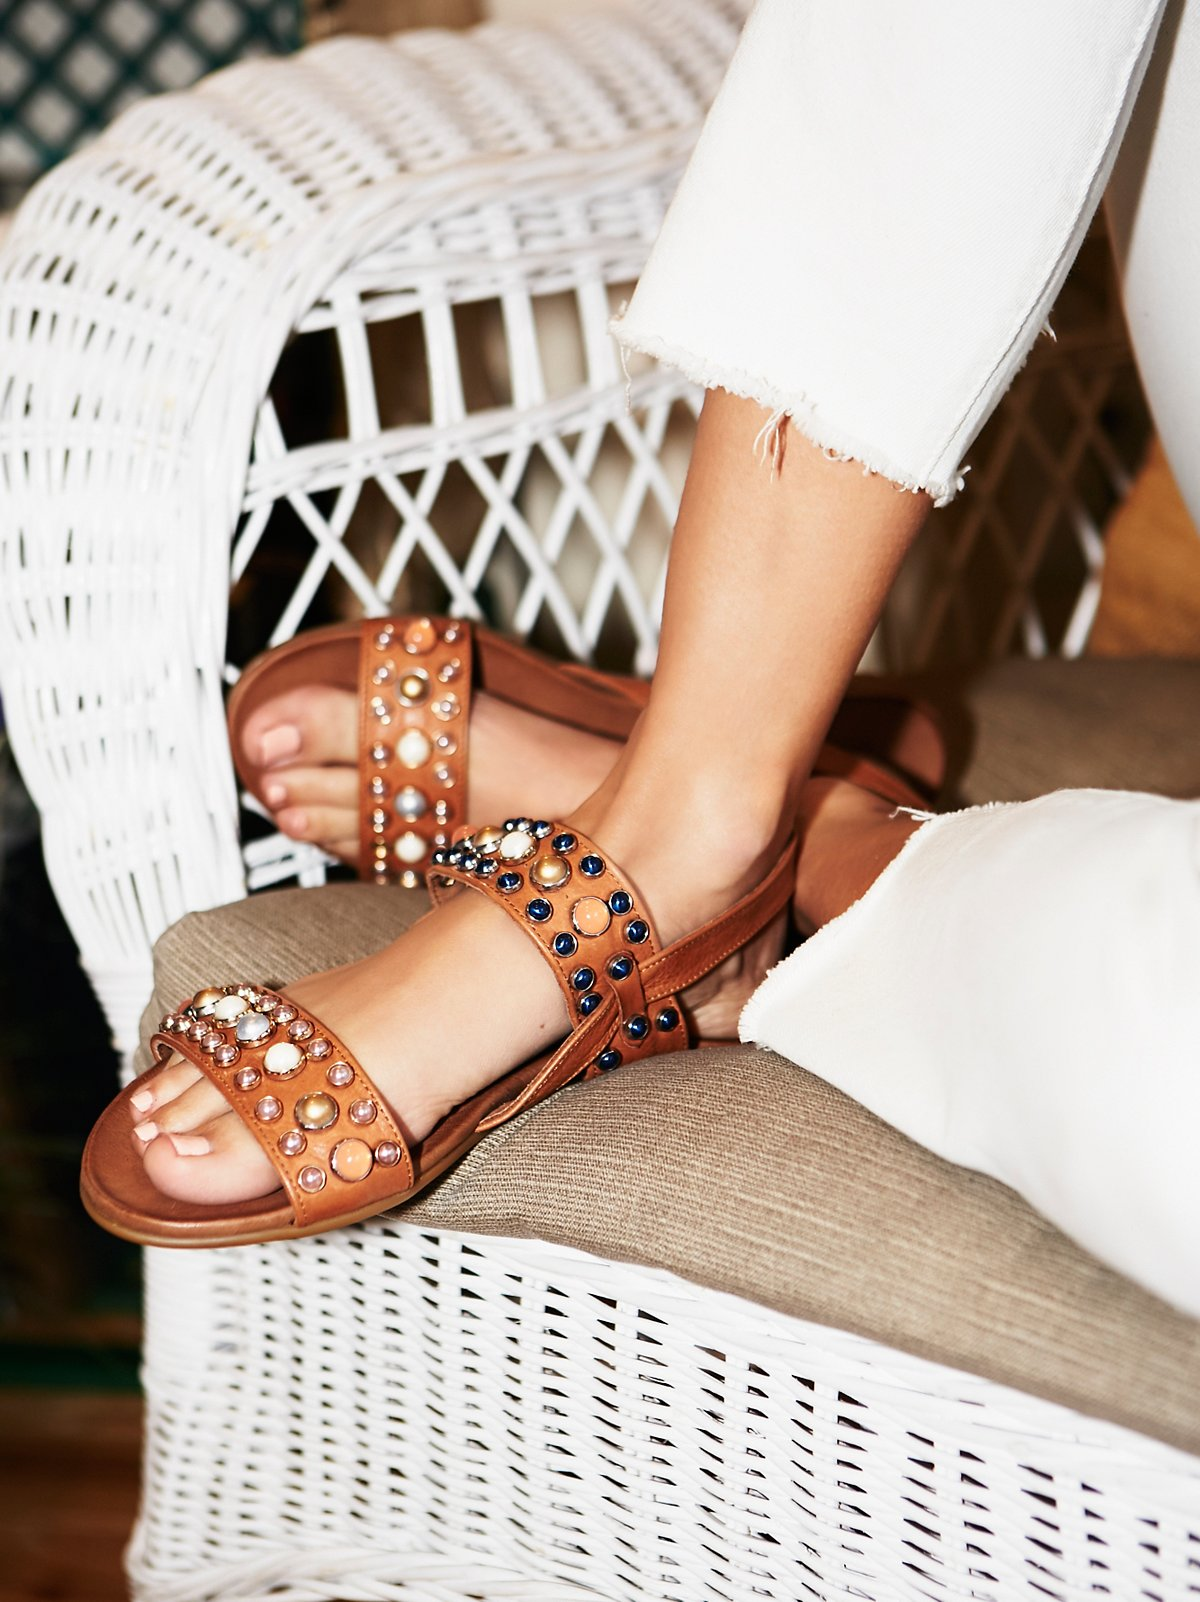 Del Ray缀饰凉鞋